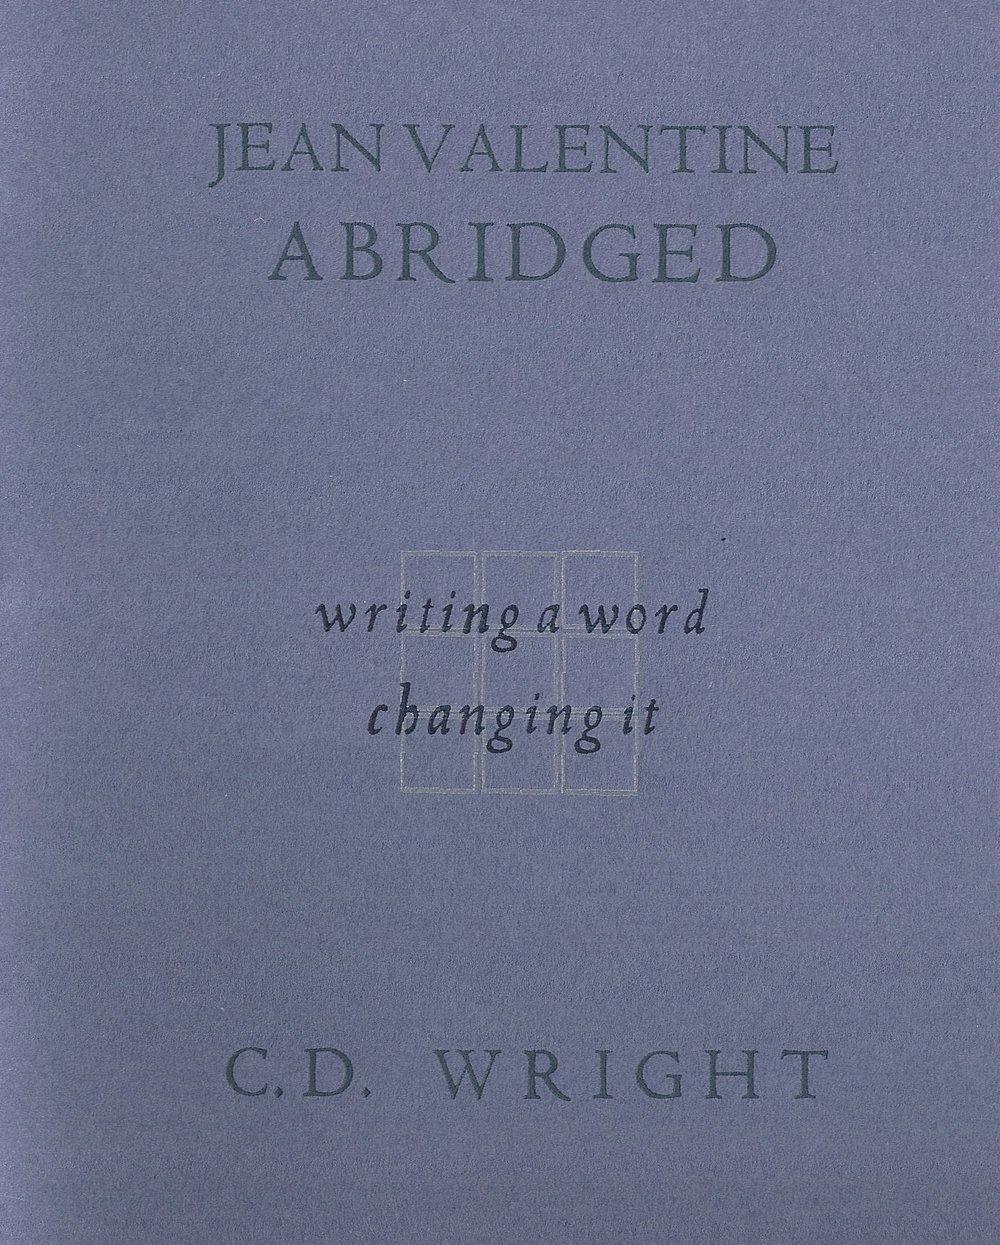 JeanValentine-Cover.jpg